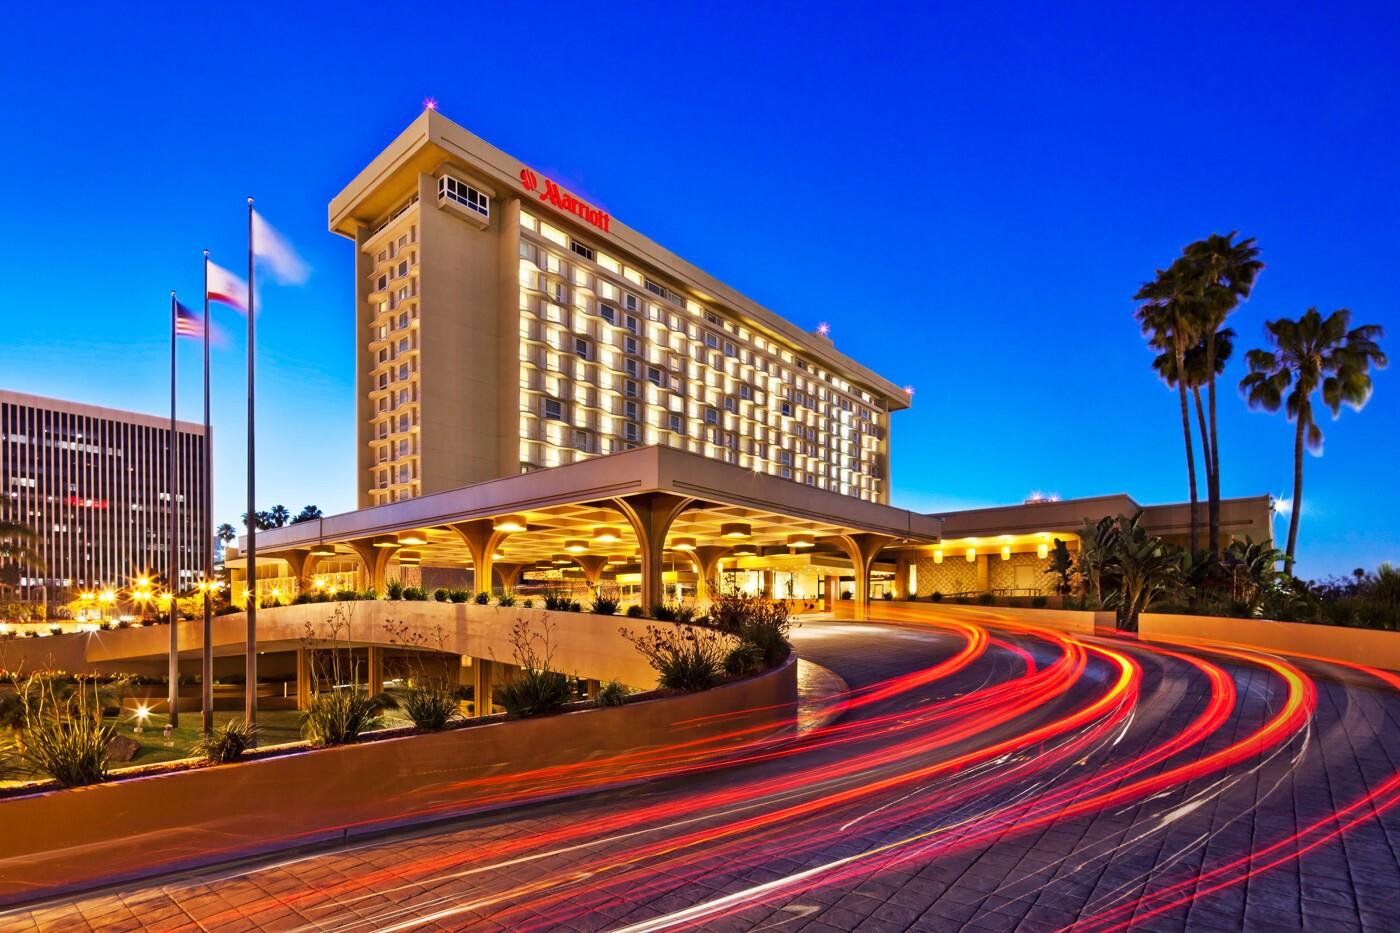 LAX hotels